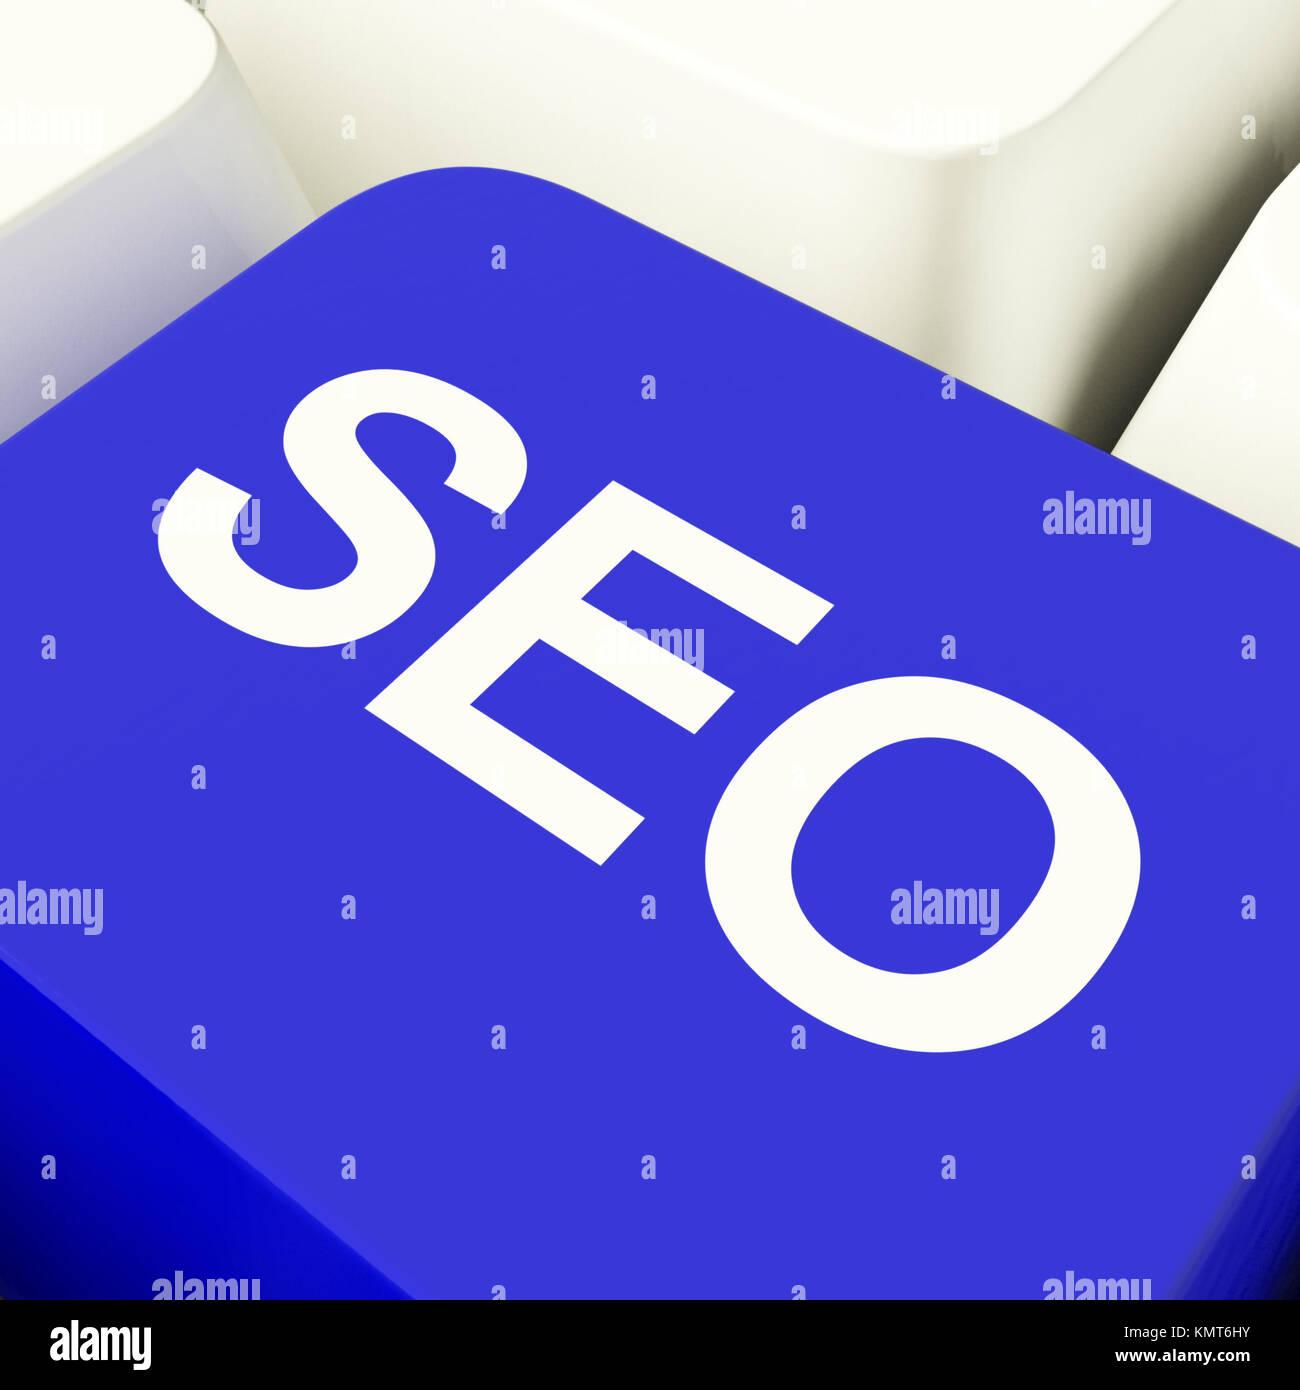 SEO Computer Key In Blue Showing Internet Marketing And Optimisation - Stock Image